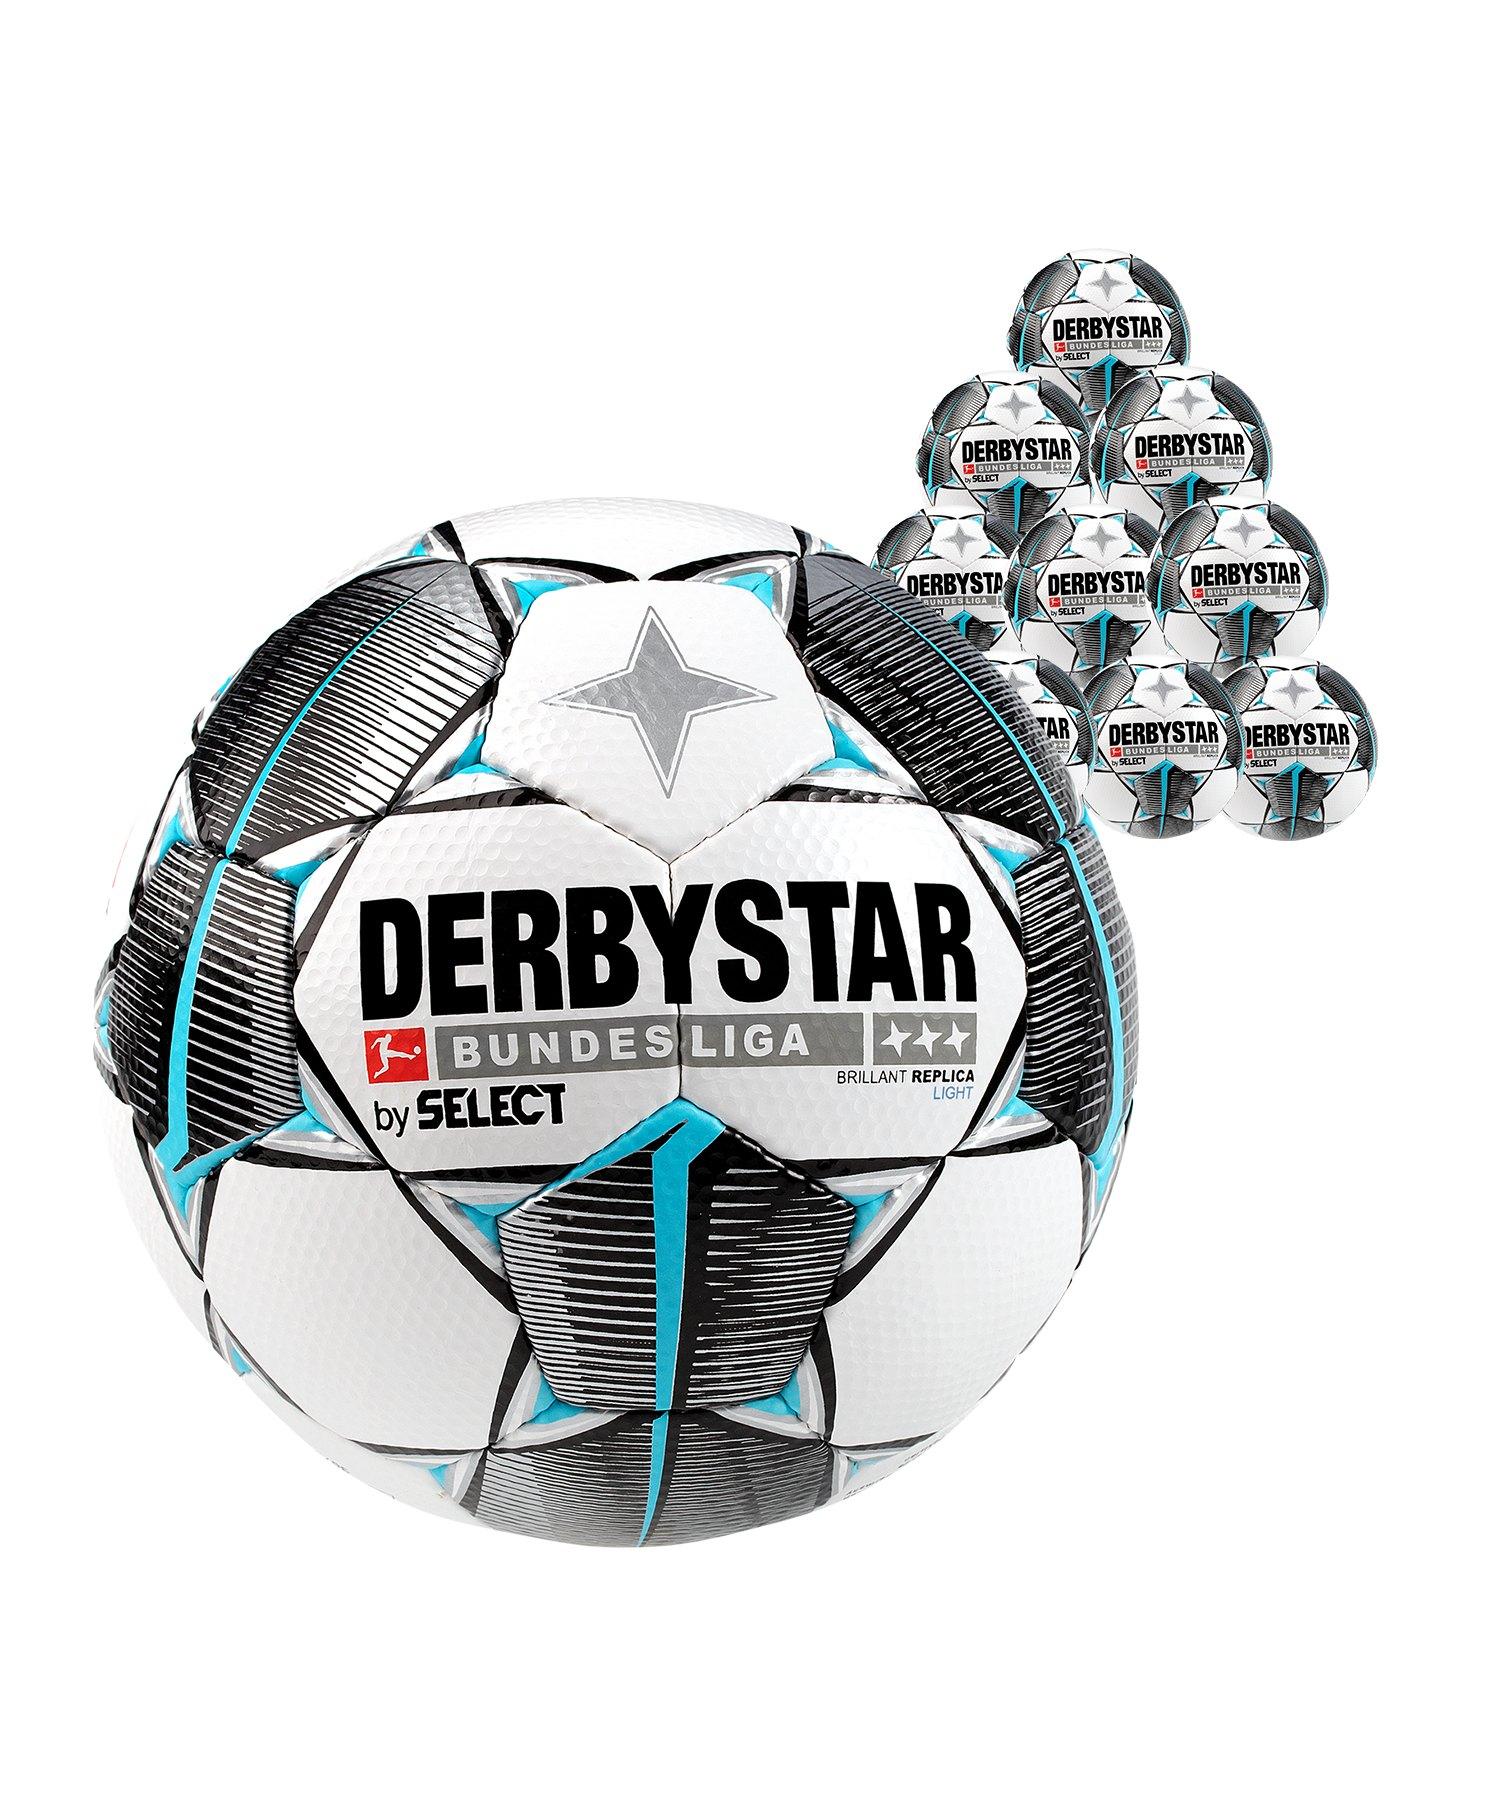 Derbystar Bundesliga Bril. Replica Light 20x Gr.4 Weiss F019 - weiss